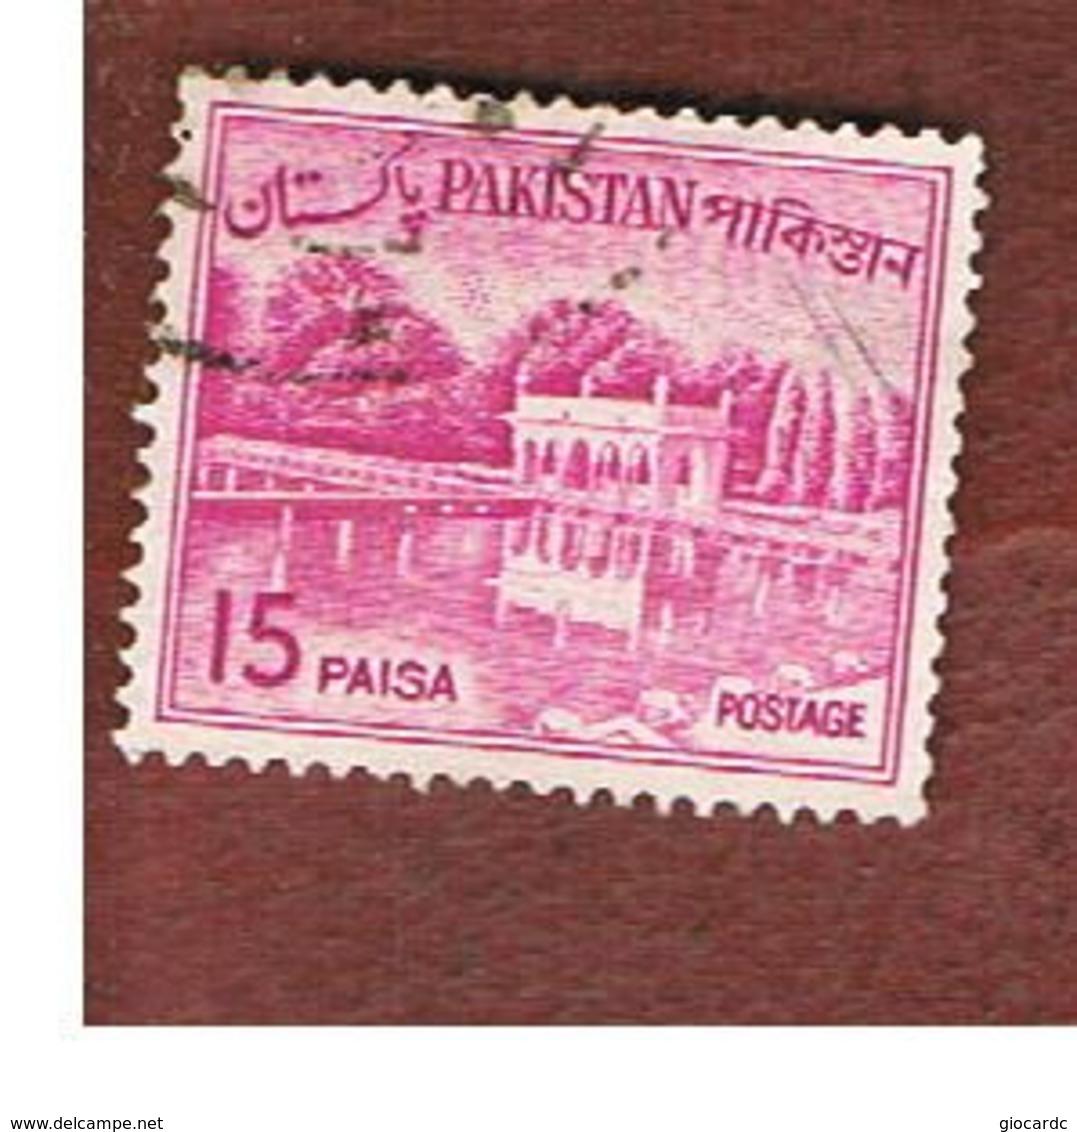 PAKISTAN  -  SG 176a  -  1965  SHALIMAR GARDENS   -  USED ° - Pakistan